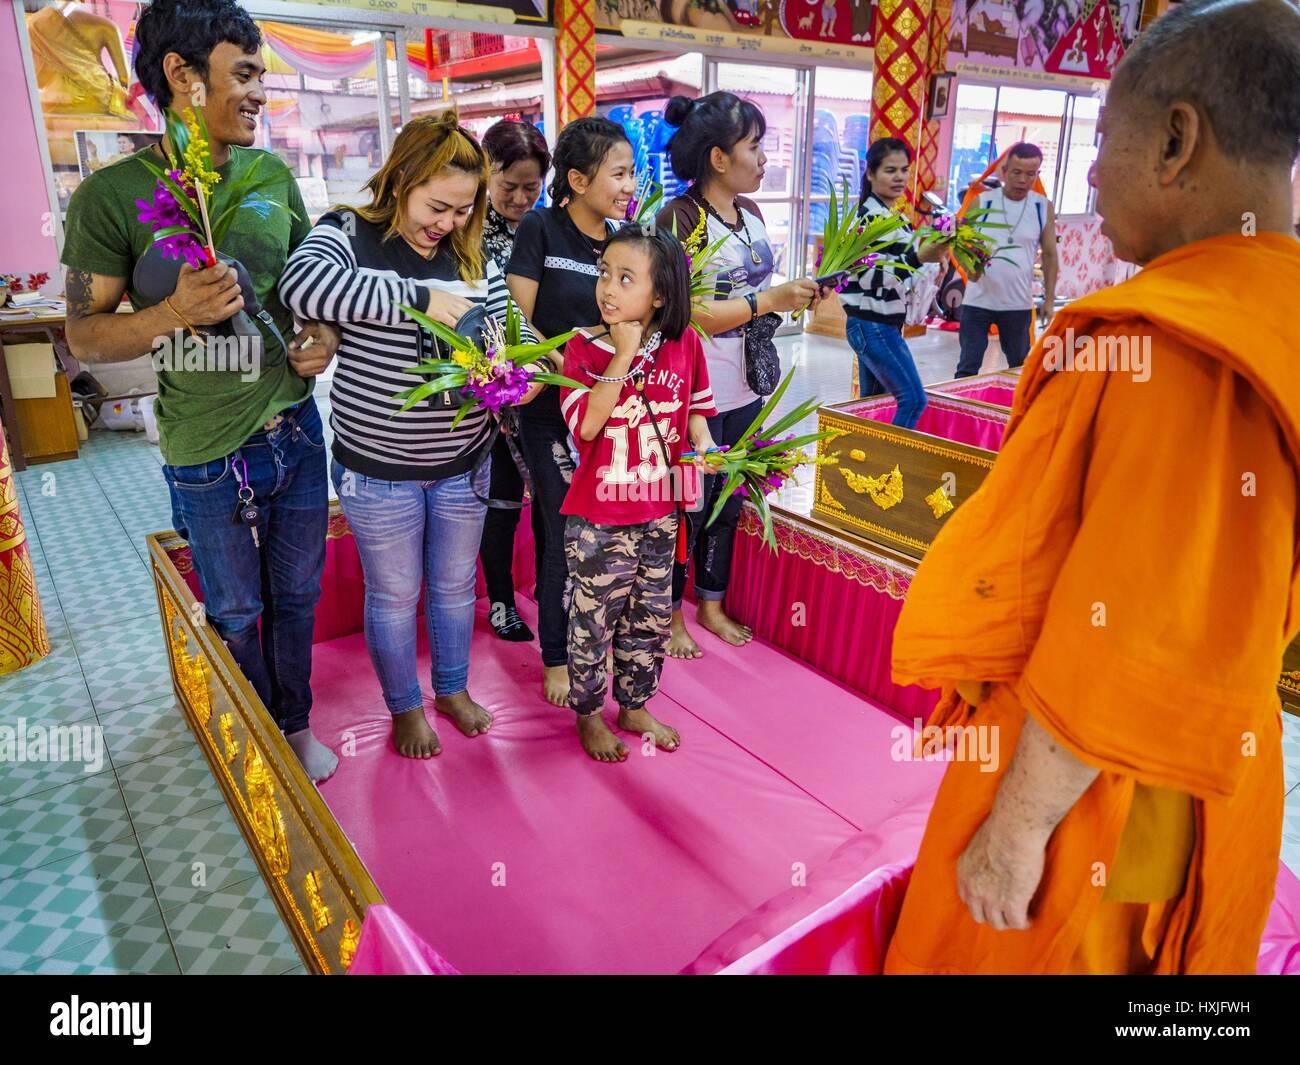 Bang Kruai, Nonthaburi, Tailandia. 29 Mar, 2017. Una familia se encuentra en el ataúd de tamaño familiar Imagen De Stock